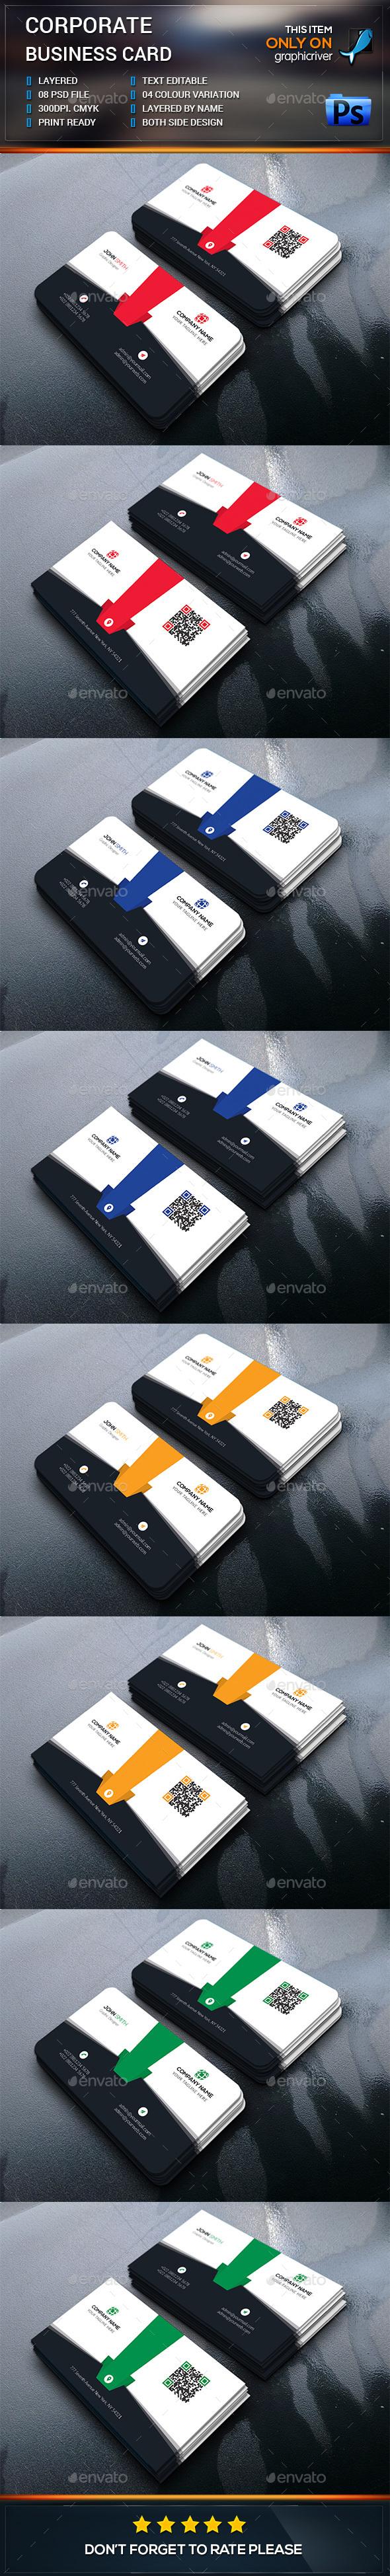 Corporate Business Card Design - Business Cards Print Templates